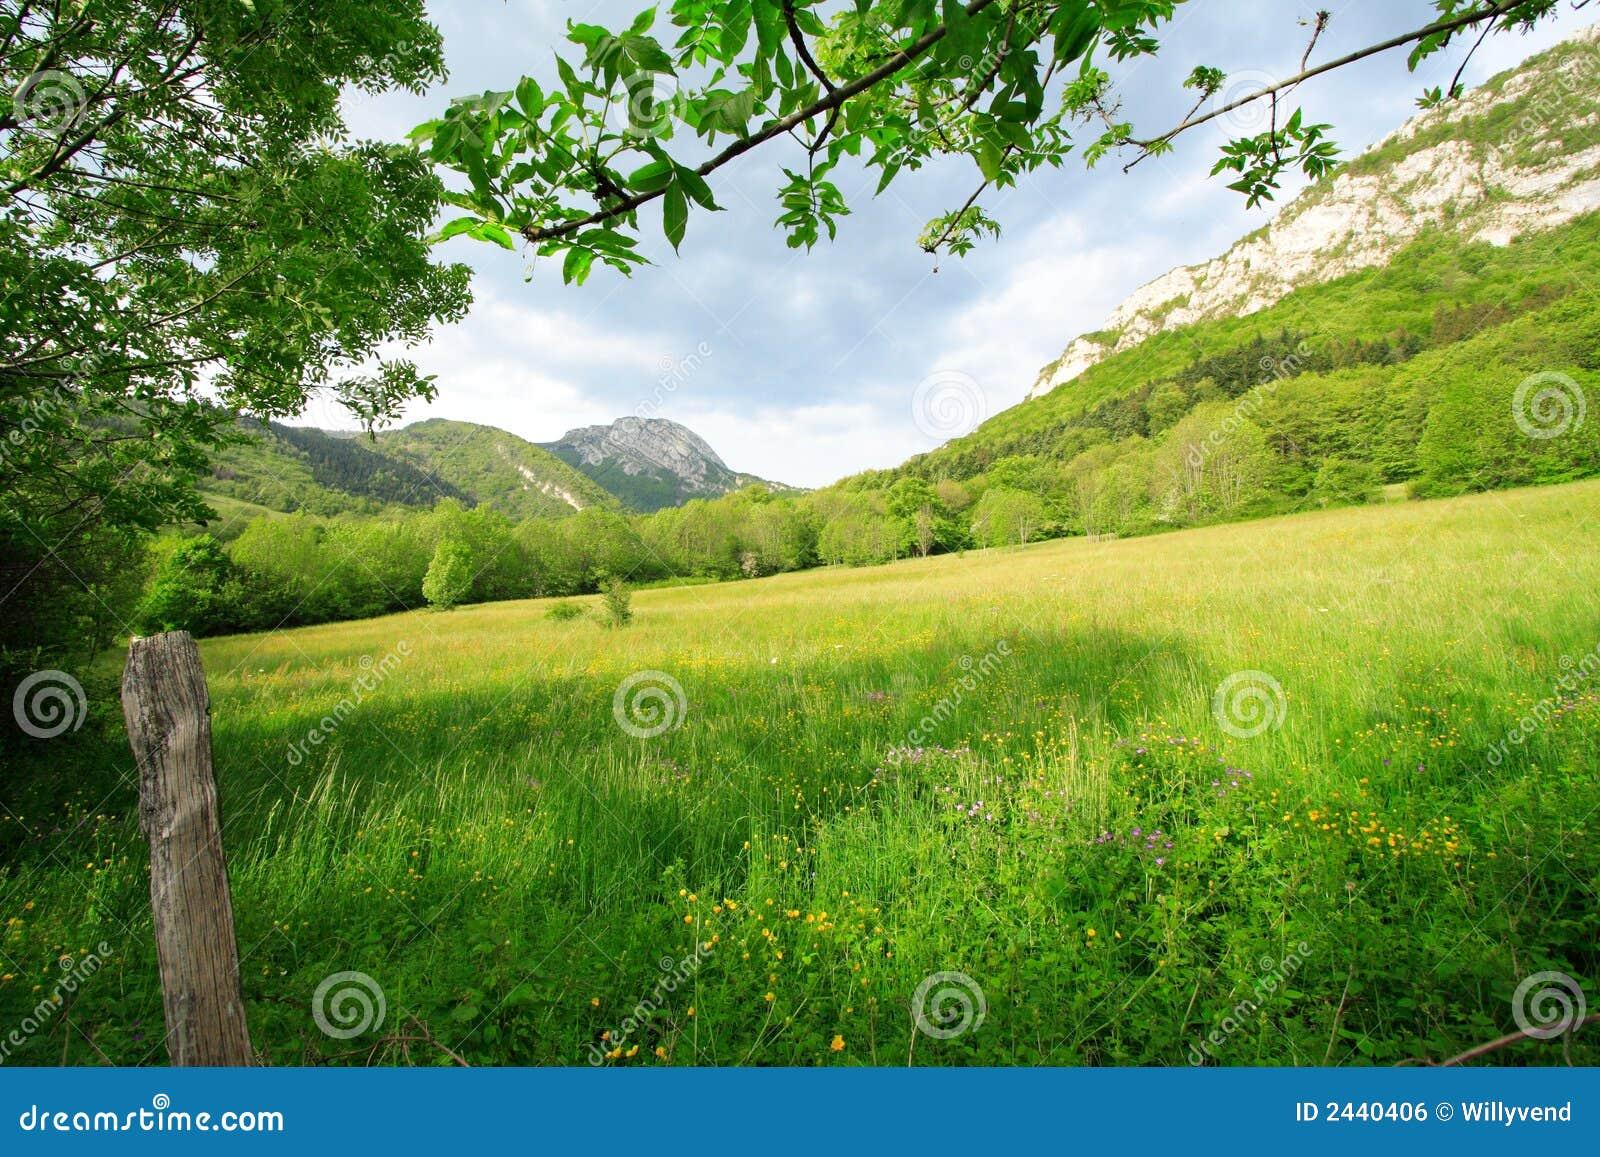 Bahay Kubo Design Lugar Rural Verde Ao Descanso Imagem De Stock Royalty Free